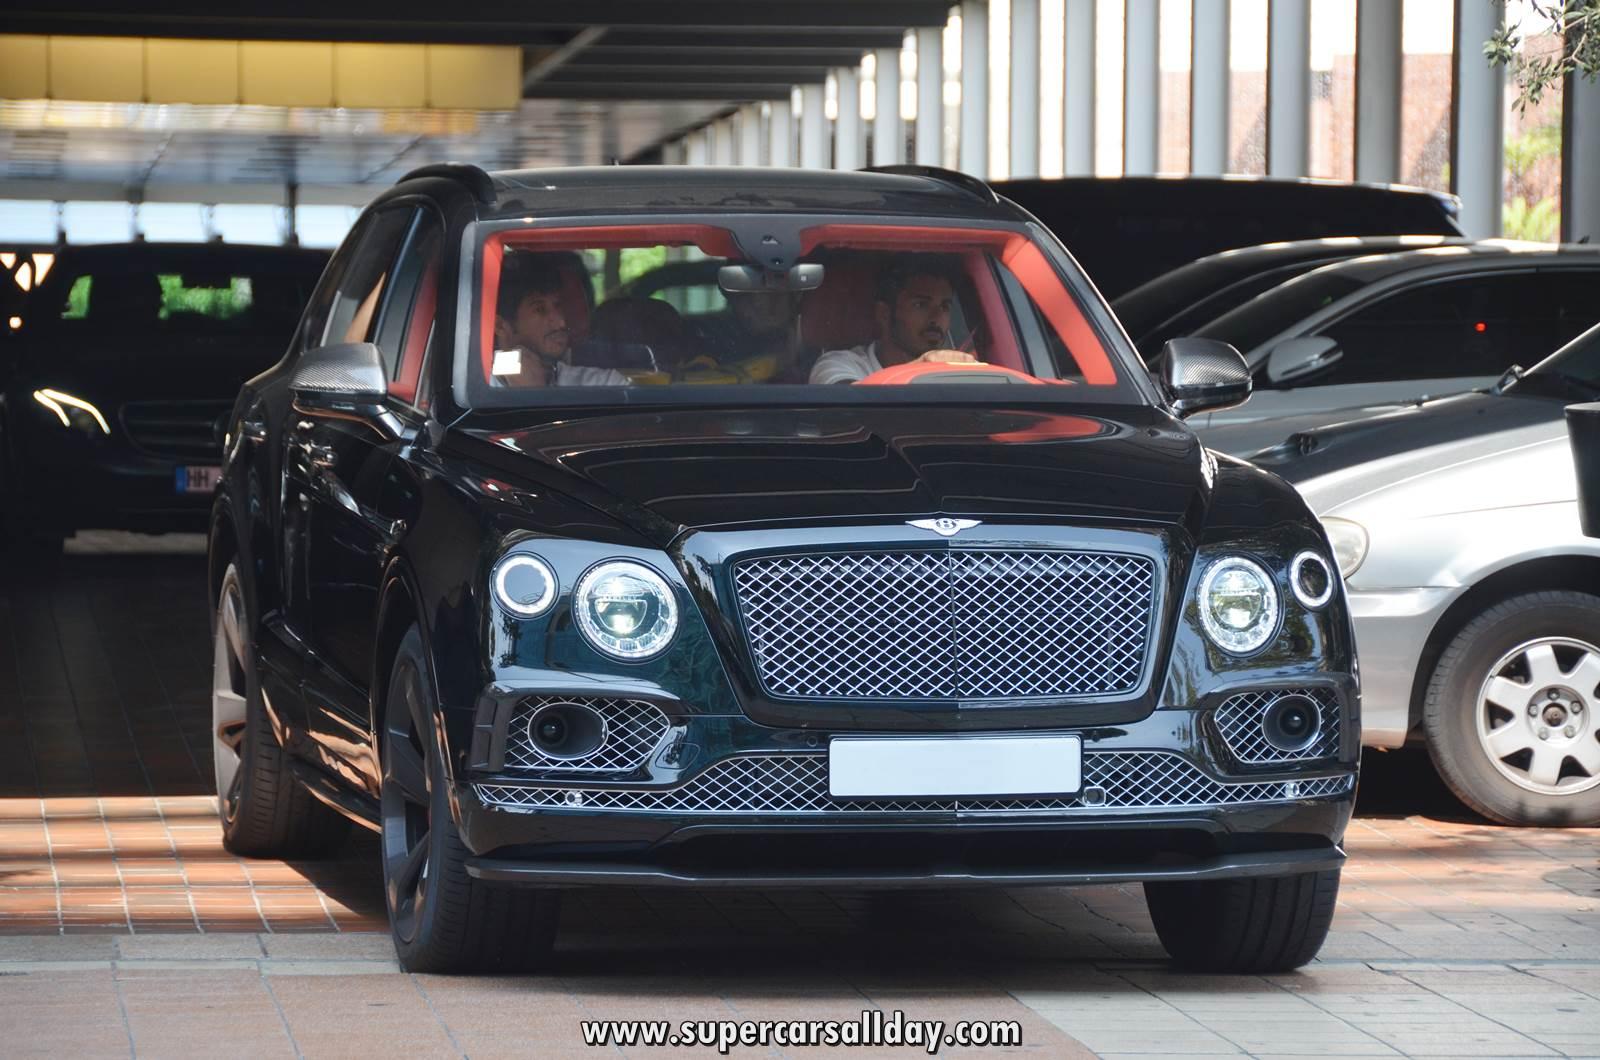 Bentley Bentayga - Supercars All Day [Exotic Cars | Photo Car